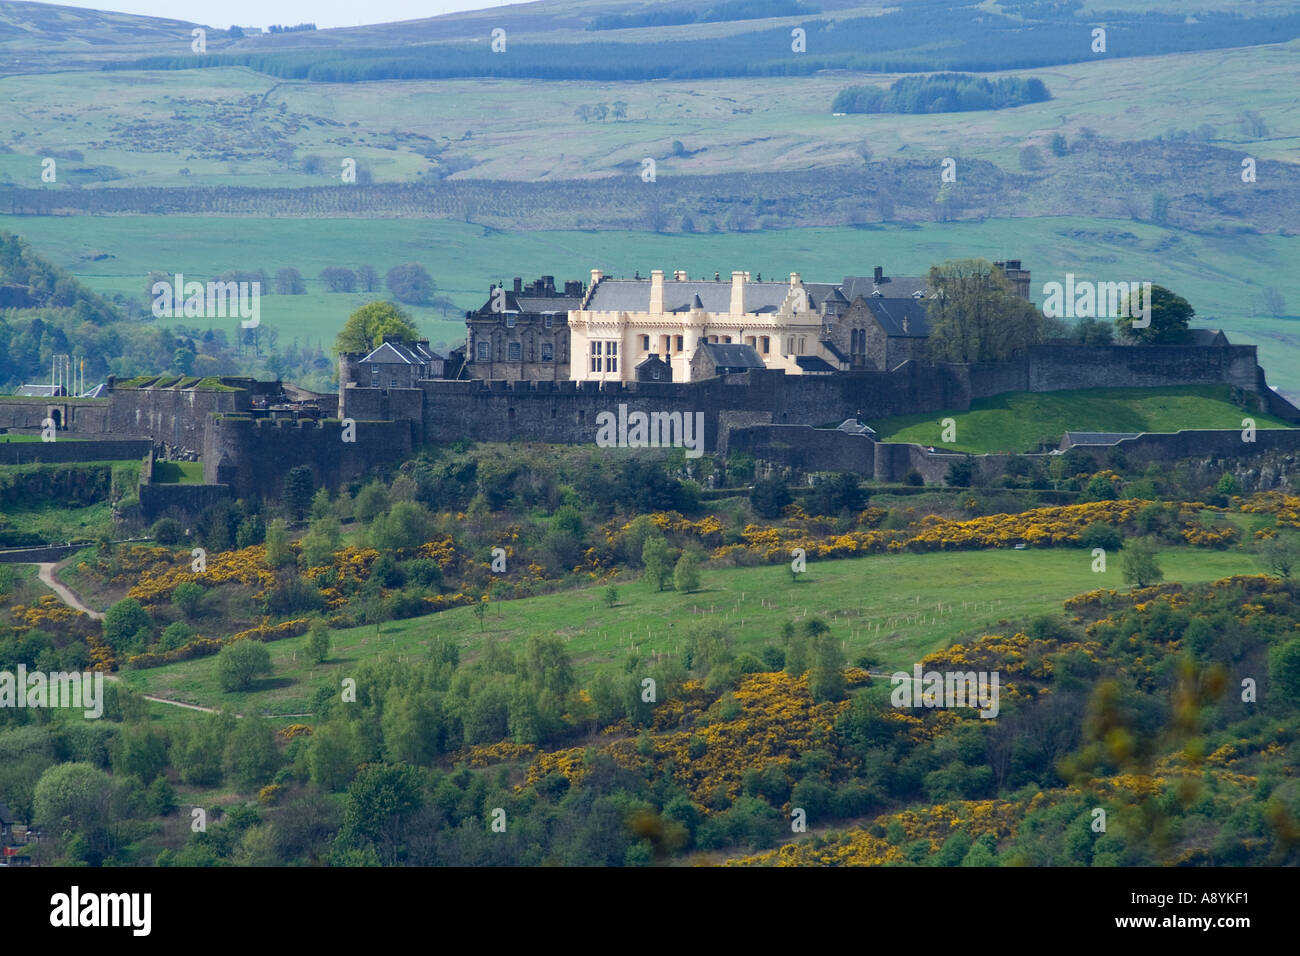 dh STIRLINGSHIRE Stirling Castillo de Stirling Castillos históricos escoceses escocia Foto de stock